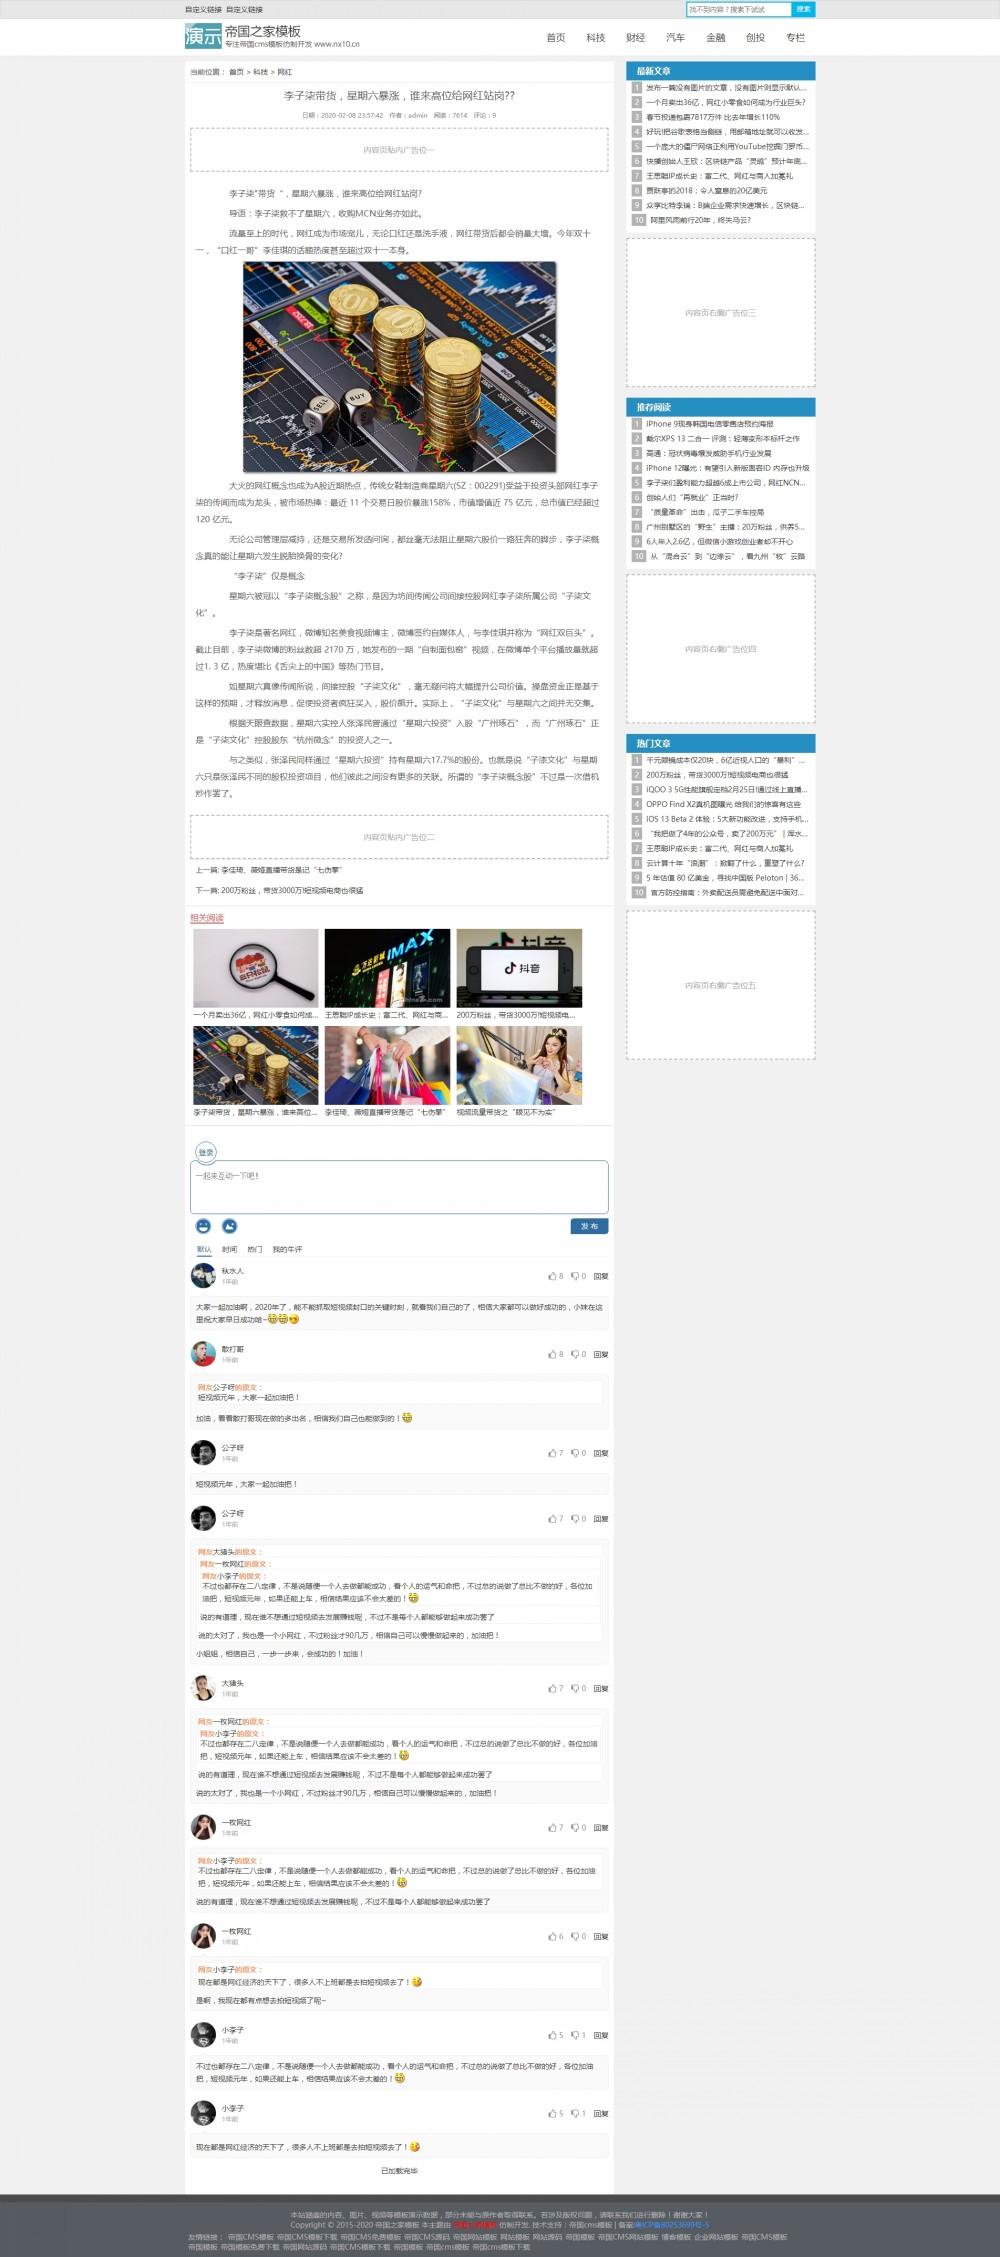 [DG-0240]响应式博客资讯帝国cms模板 响应式个人博客网站模板下载 博客文章 第3张